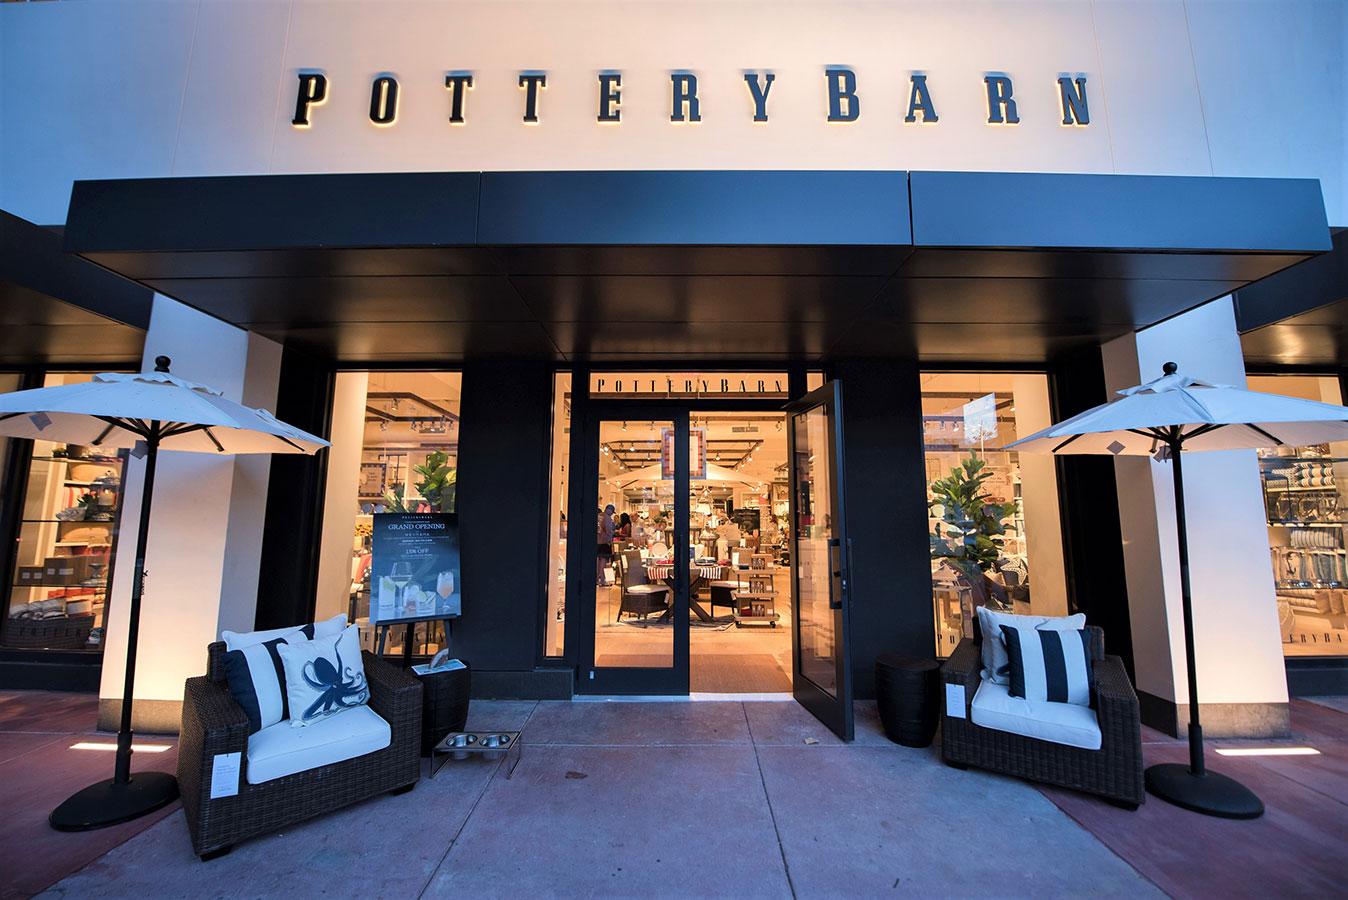 Pottery Barn entrance